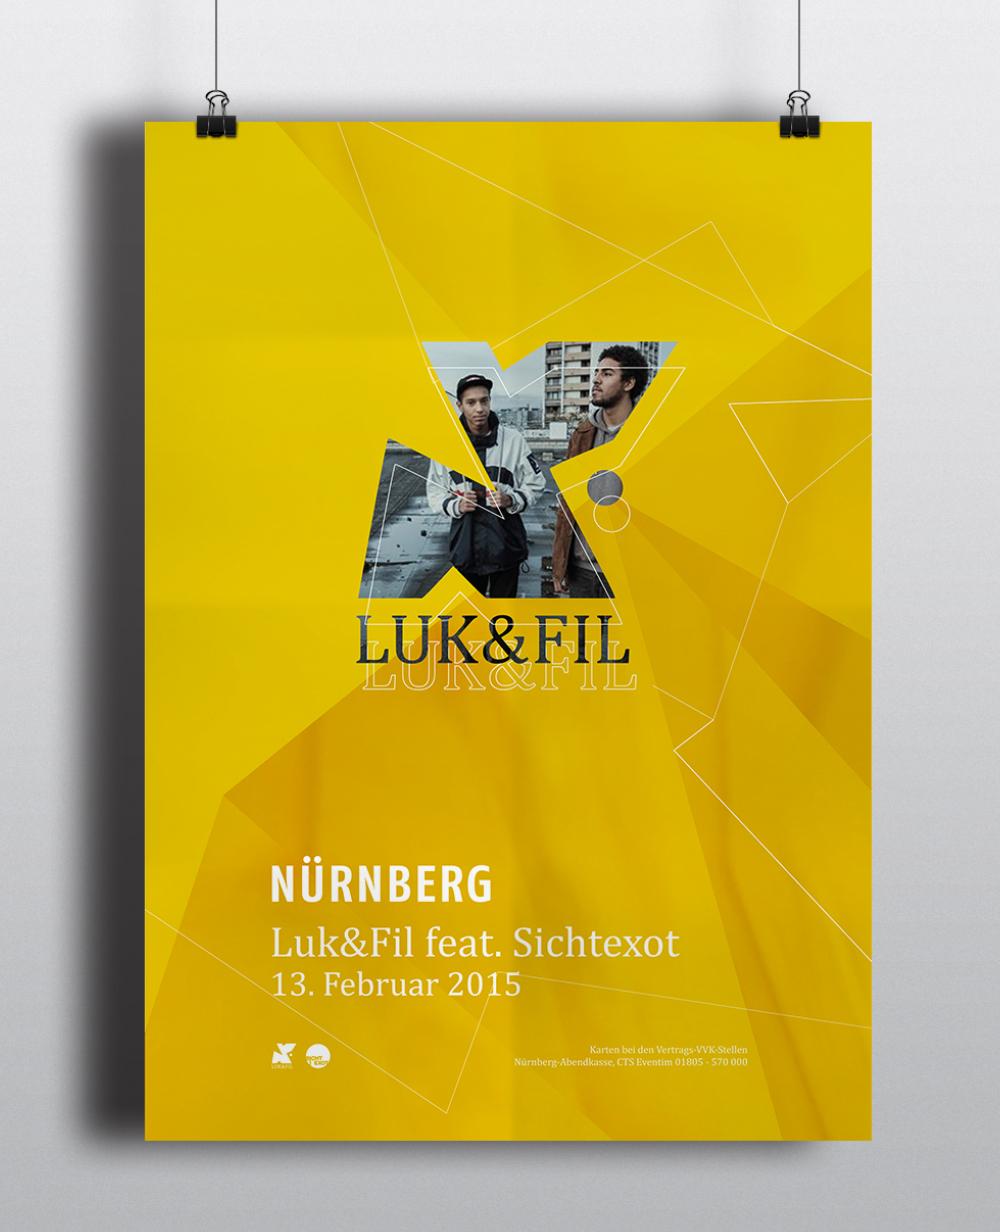 Corporate Design Portfolio - Schreiber Tobias - Luk & Fil Plakatgestaltung Key-Visual